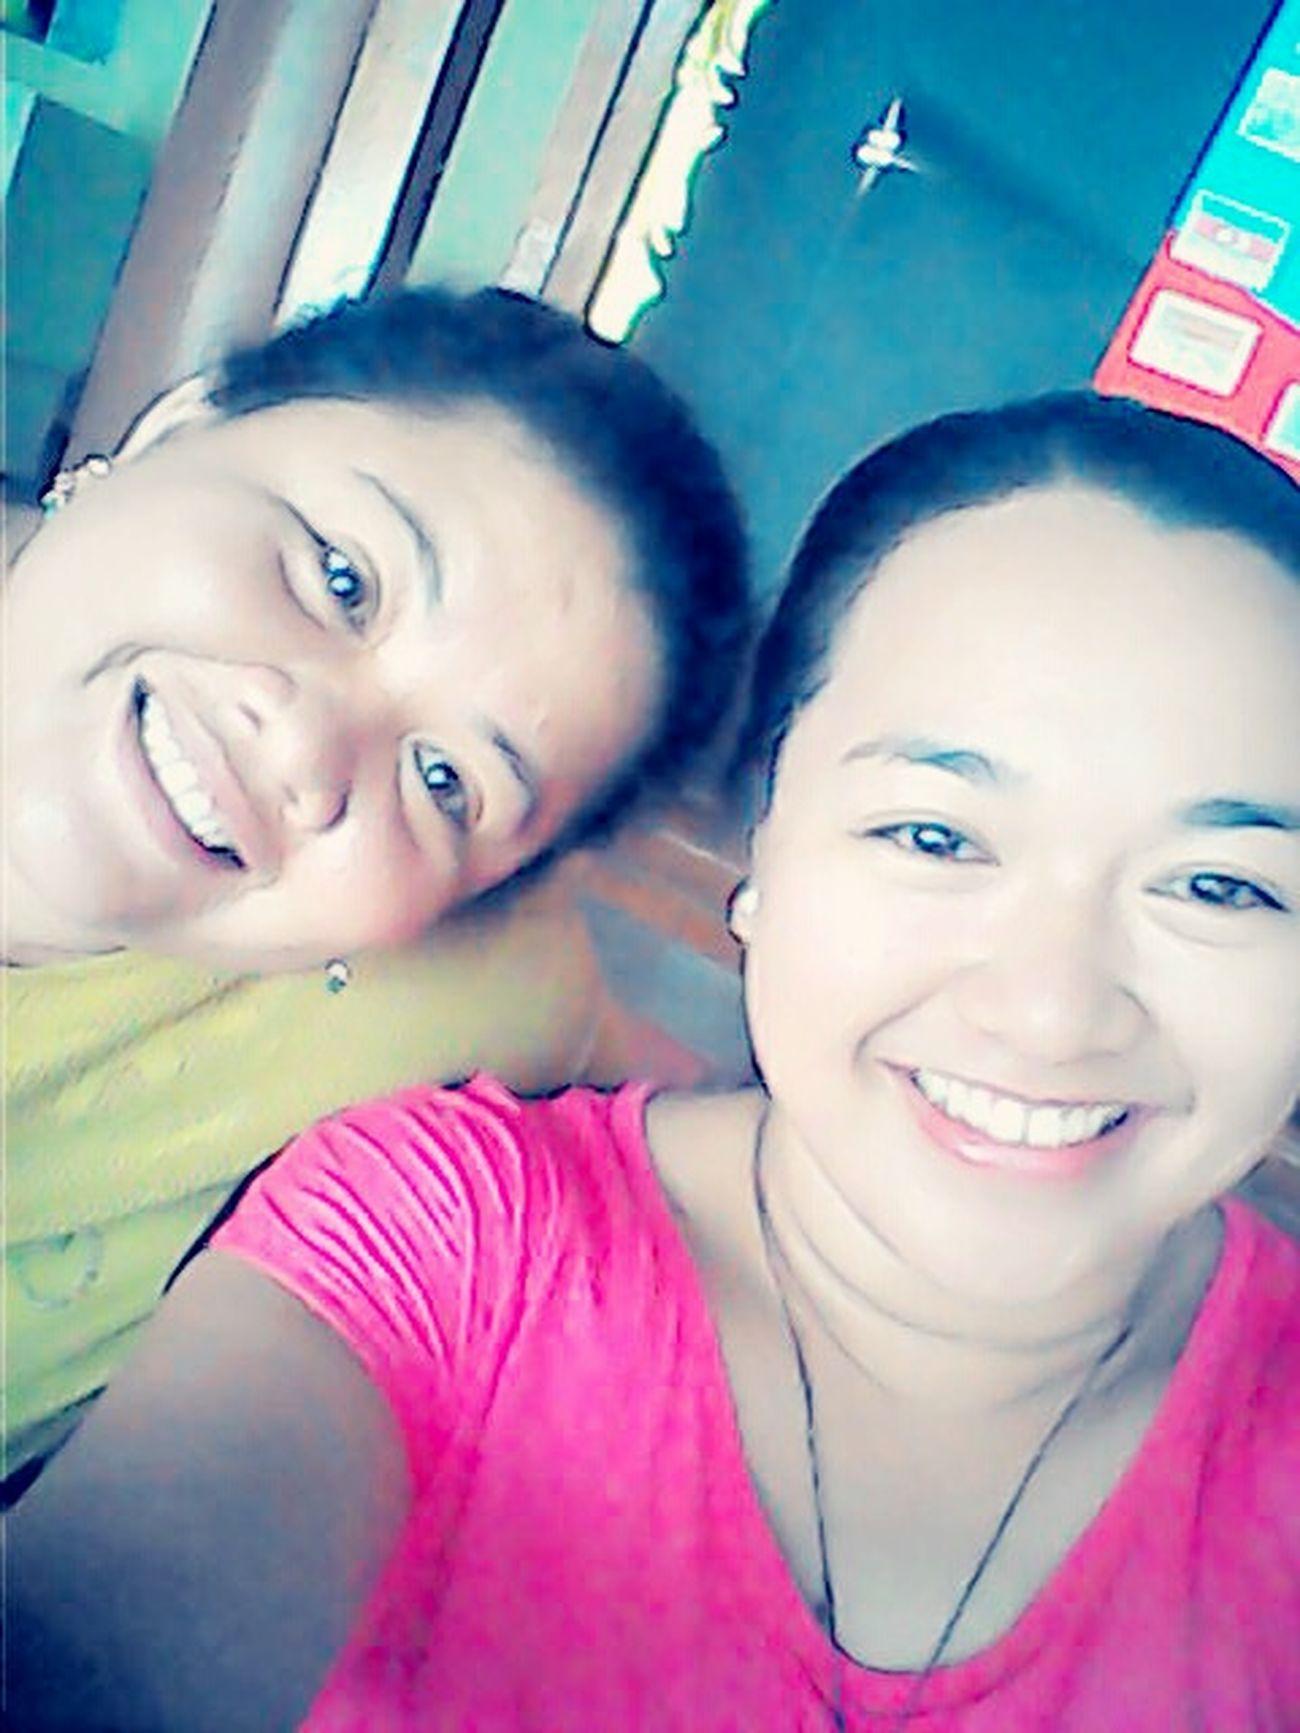 Big smiles gikan namong mag practice teach na rung ting klase puhon. 😄😃😂 Excited Selfie Selca